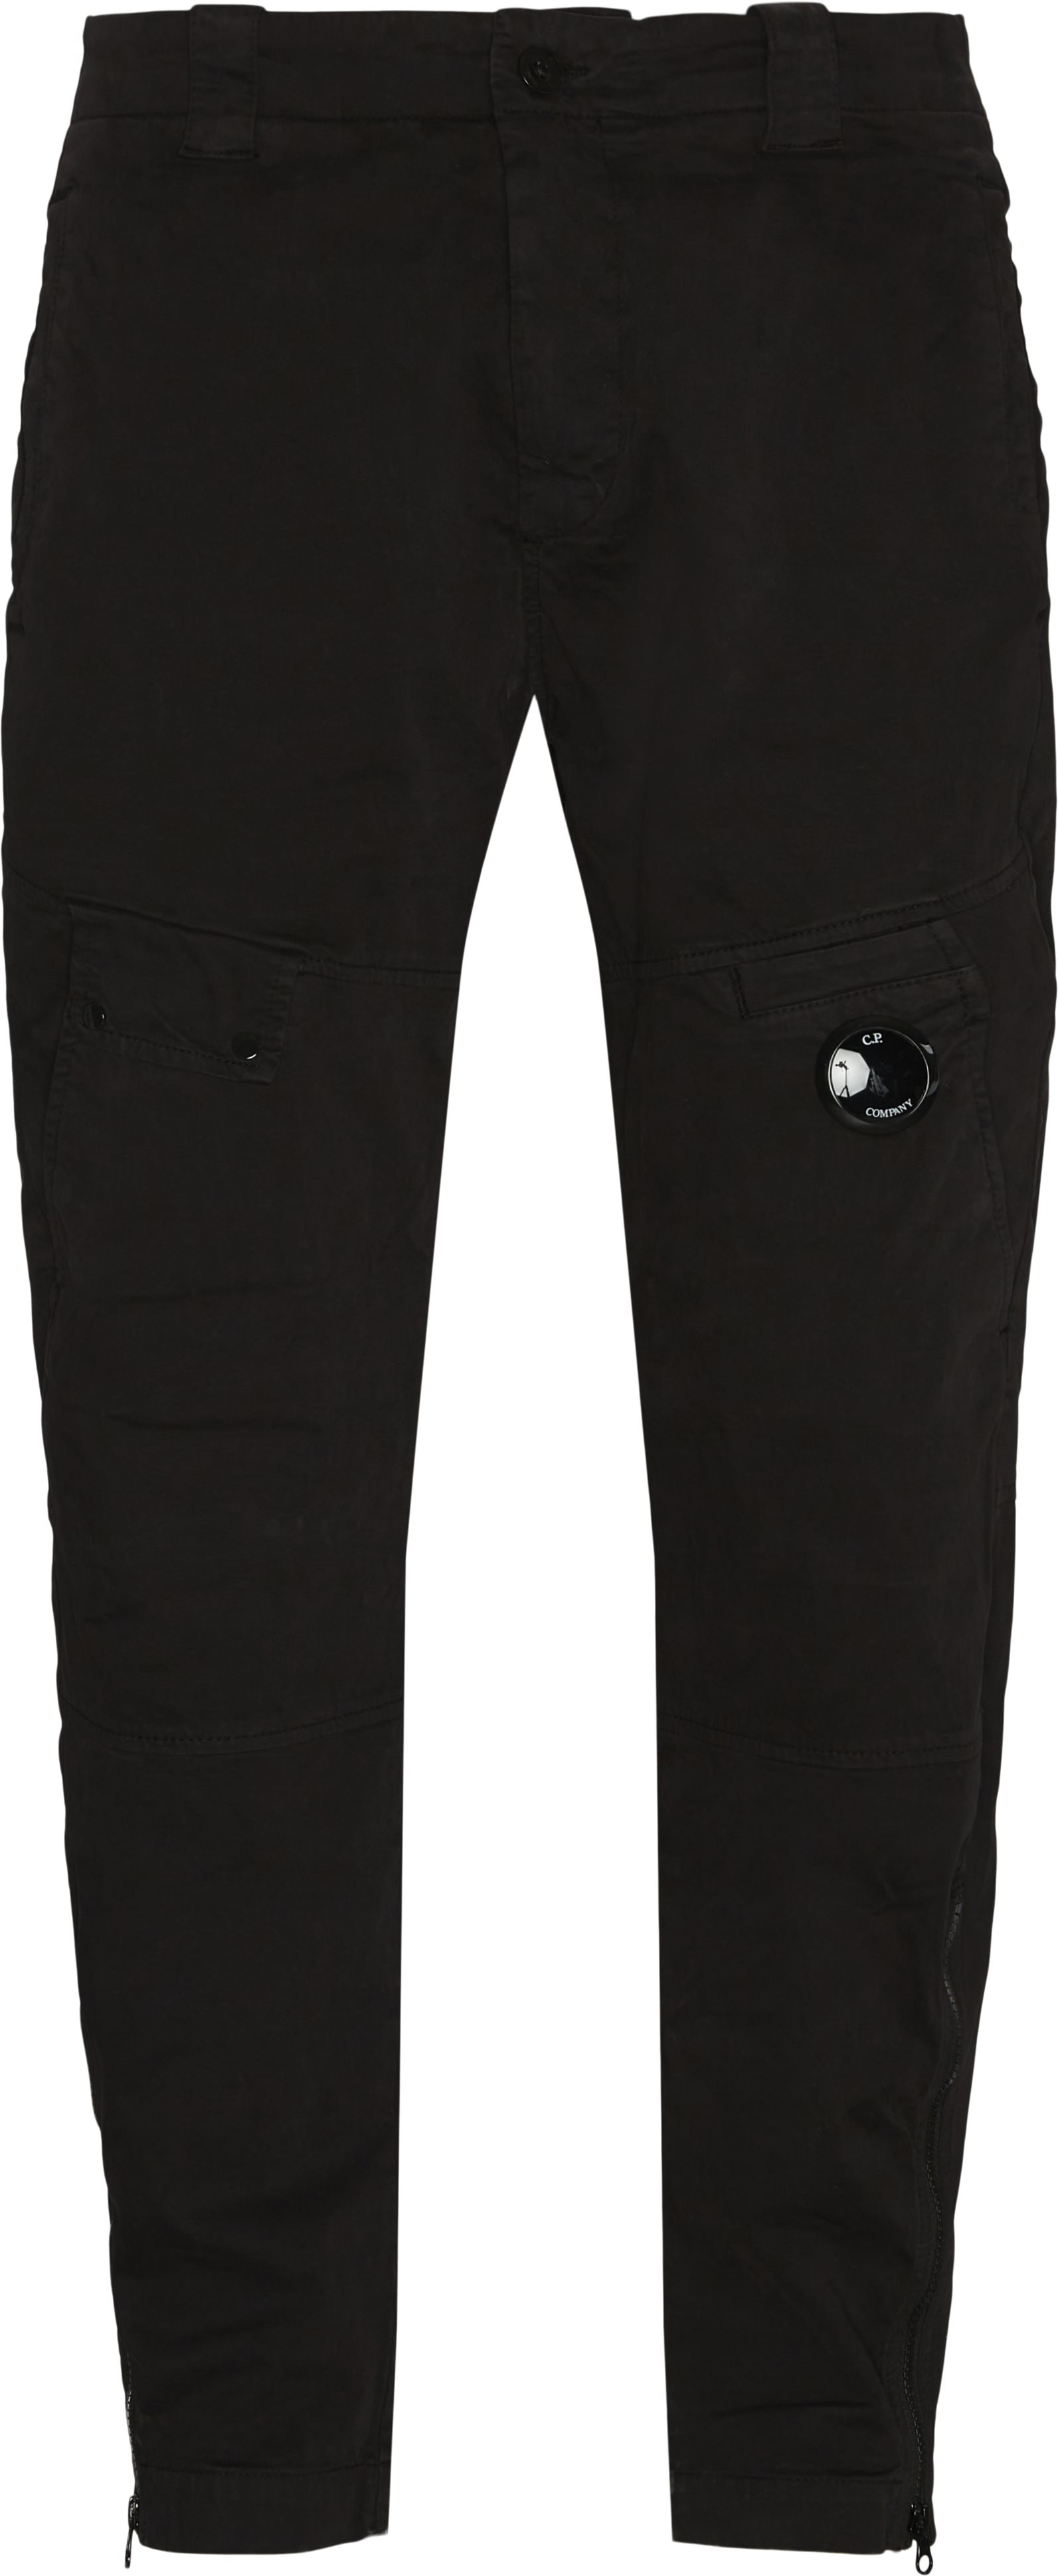 Garment Dyed Pants - Bukser - Regular fit - Sort